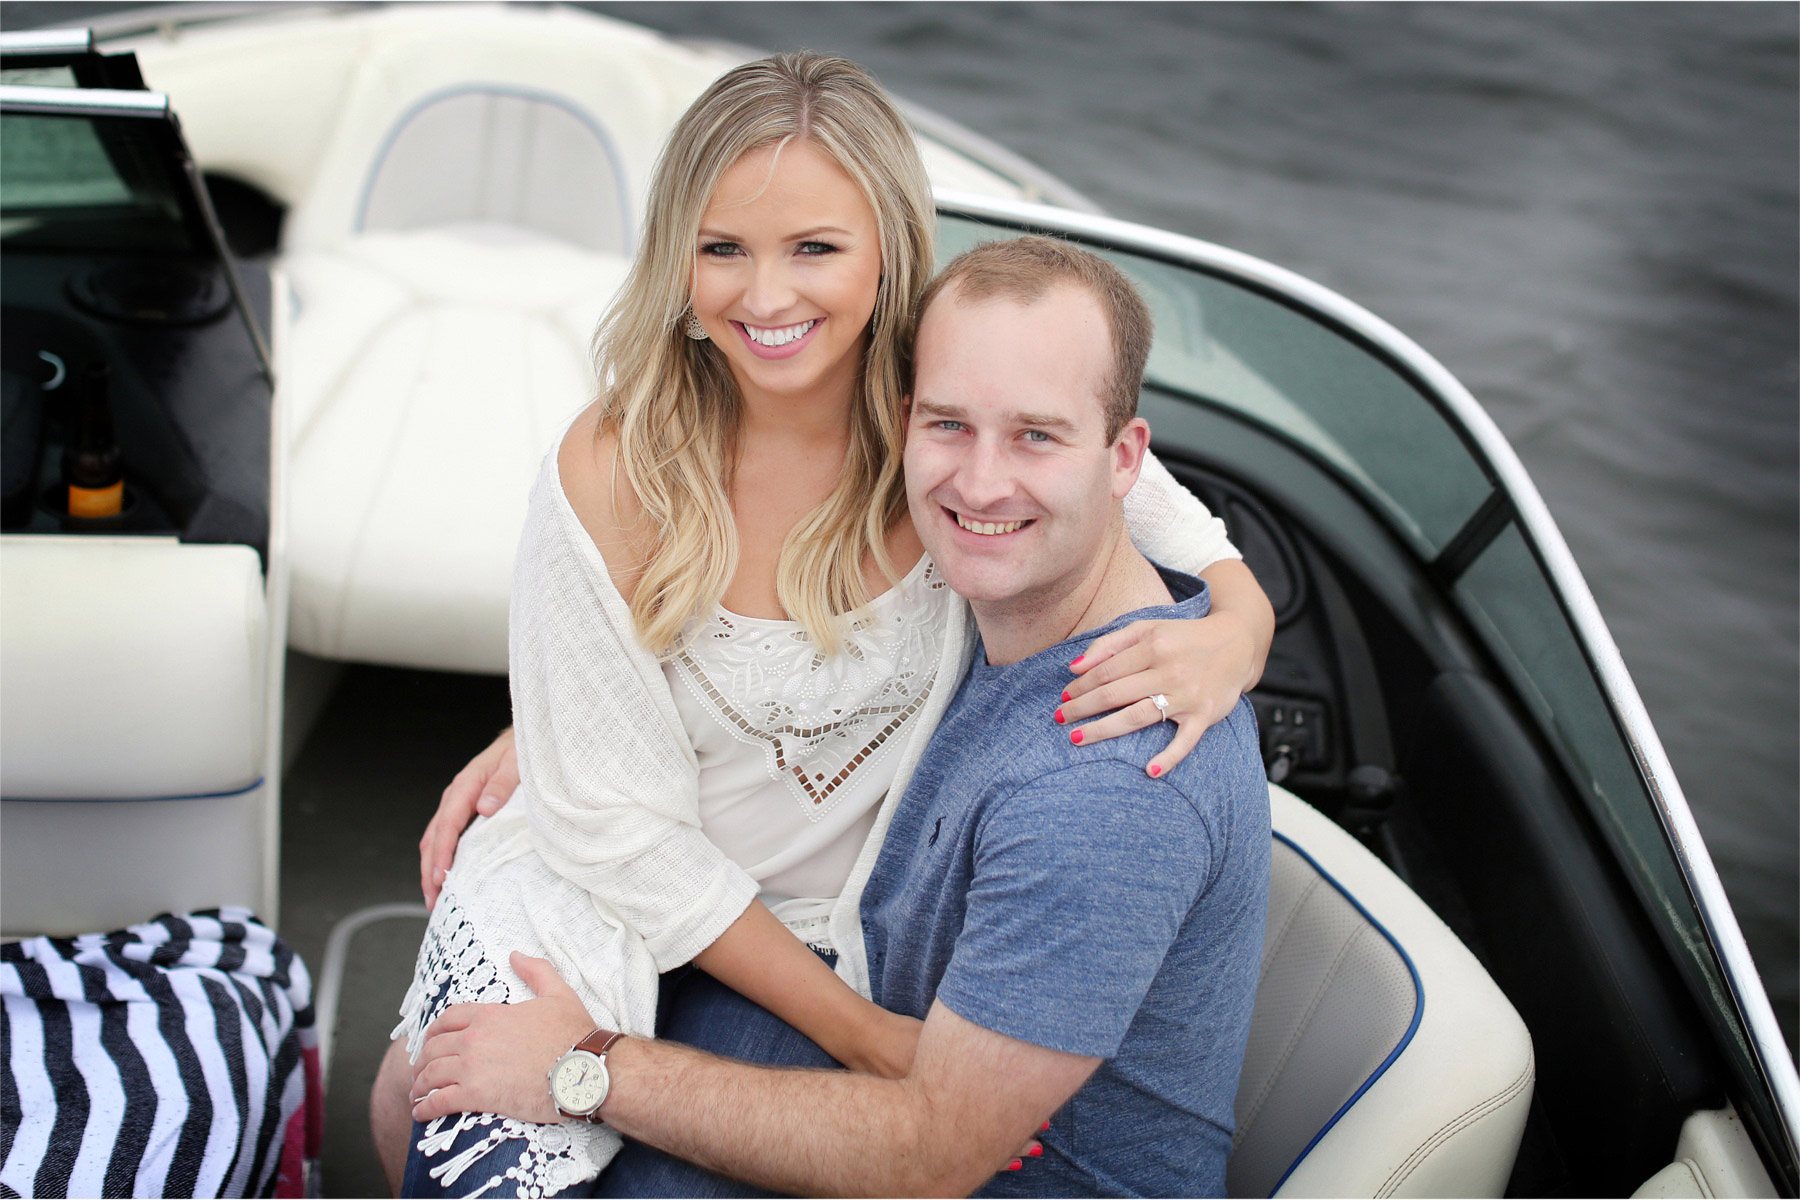 07-Wayzata-Minnesota-Engagement-Photographer-by-Andrew-Vick-Photography-Summer-Lake-Minnetonka-Embrace-Hug-Rain-Speed-Boat-Ashley-&-Kasey.jpg